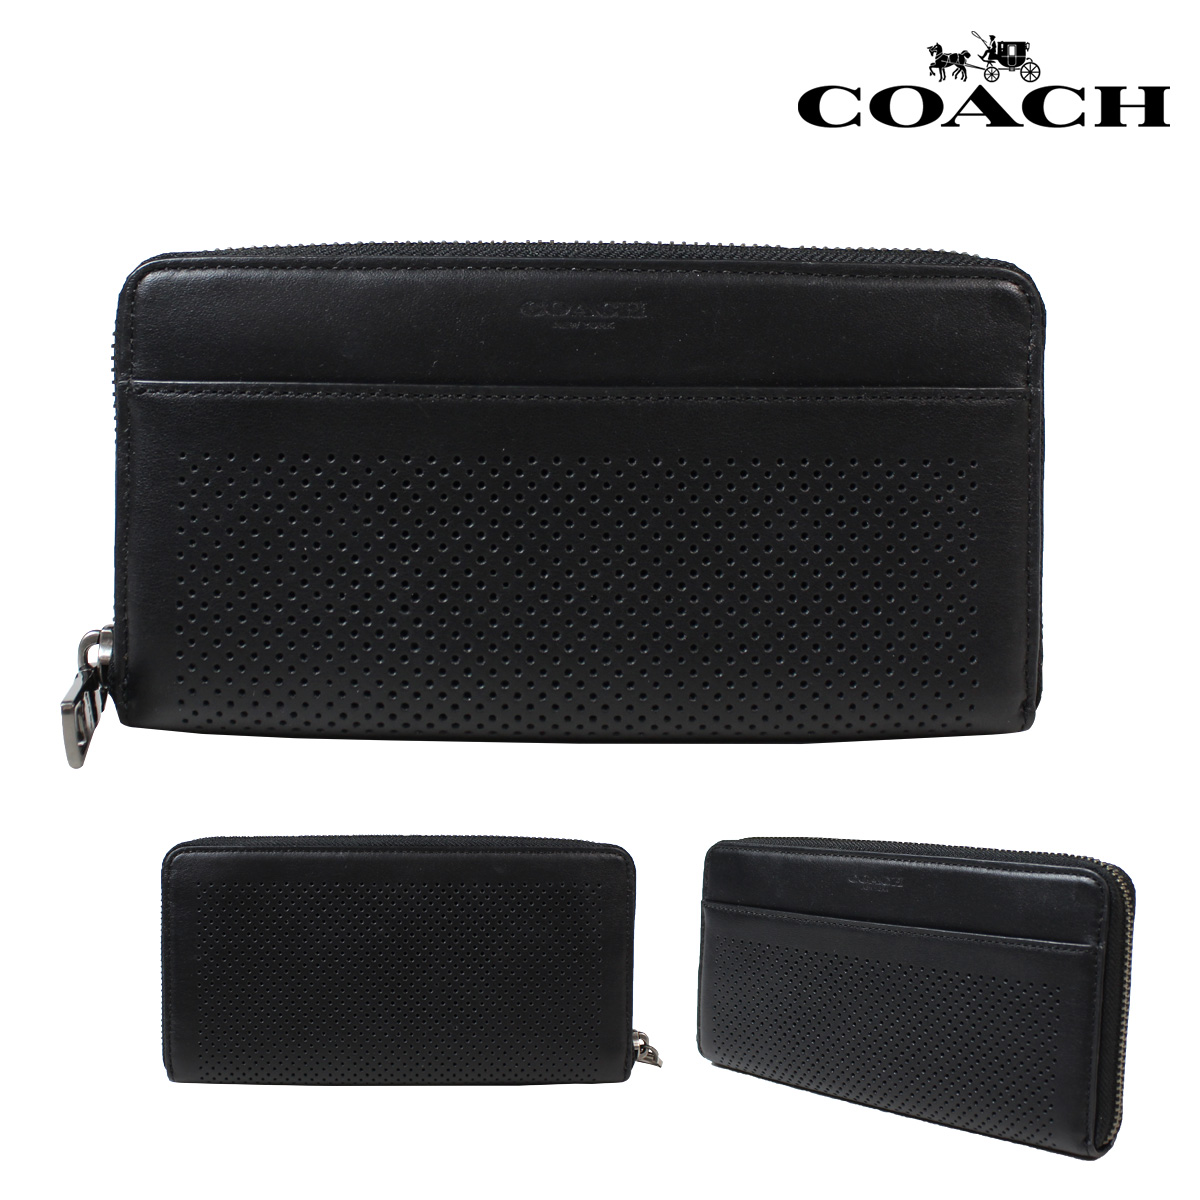 41c672c29b Coach COACH mens wallet wallet F75222 black